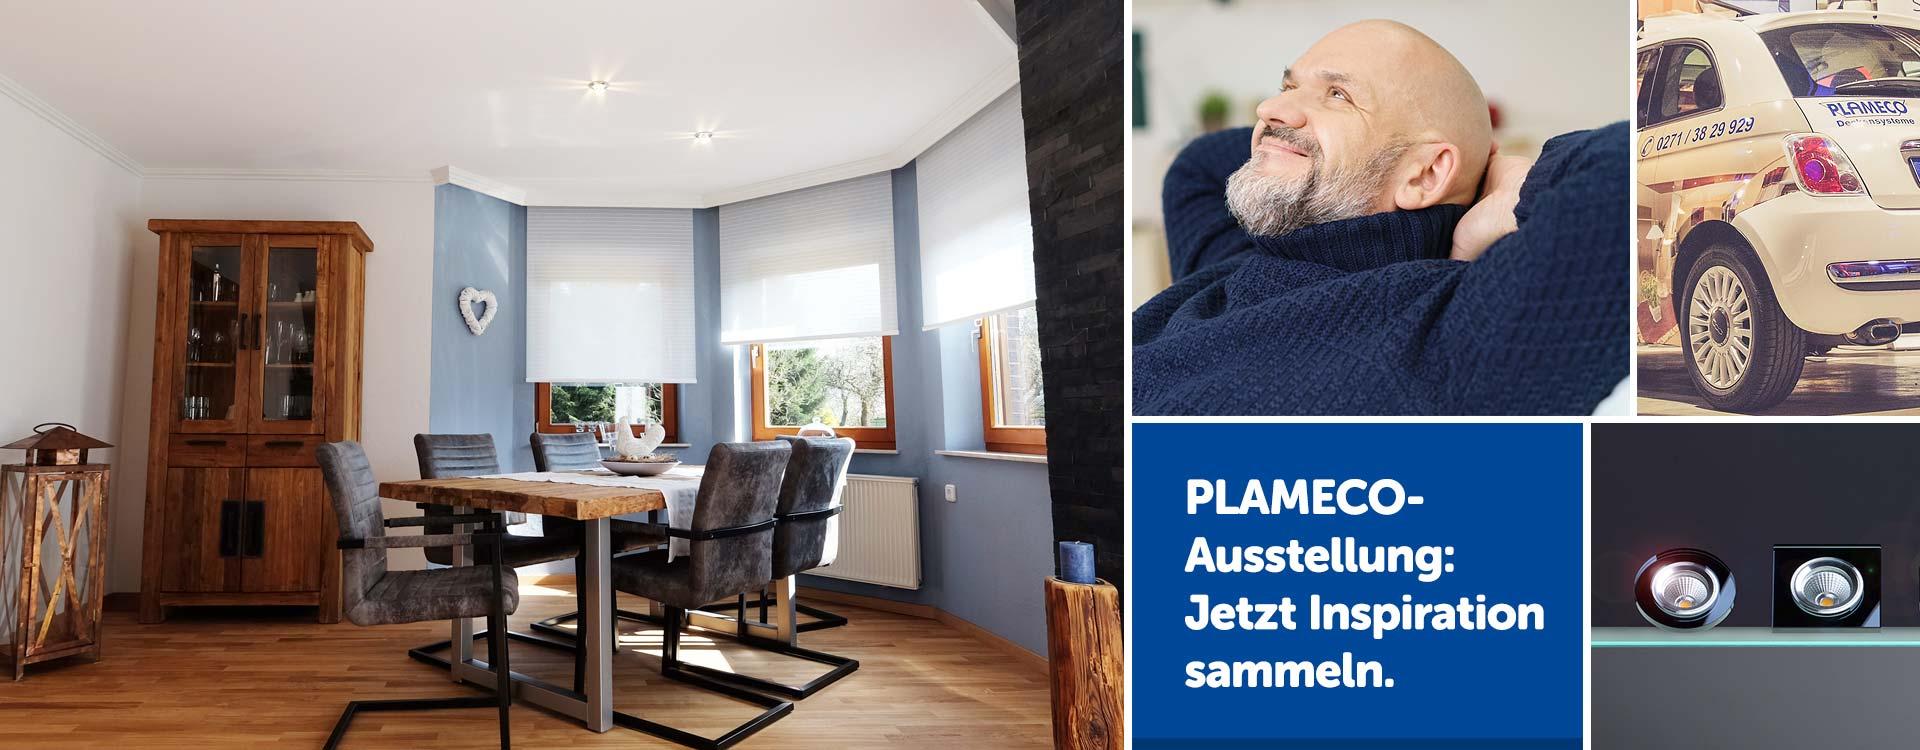 PLAMECO Spanndecken-Ausstellung Siegen Michael Bär